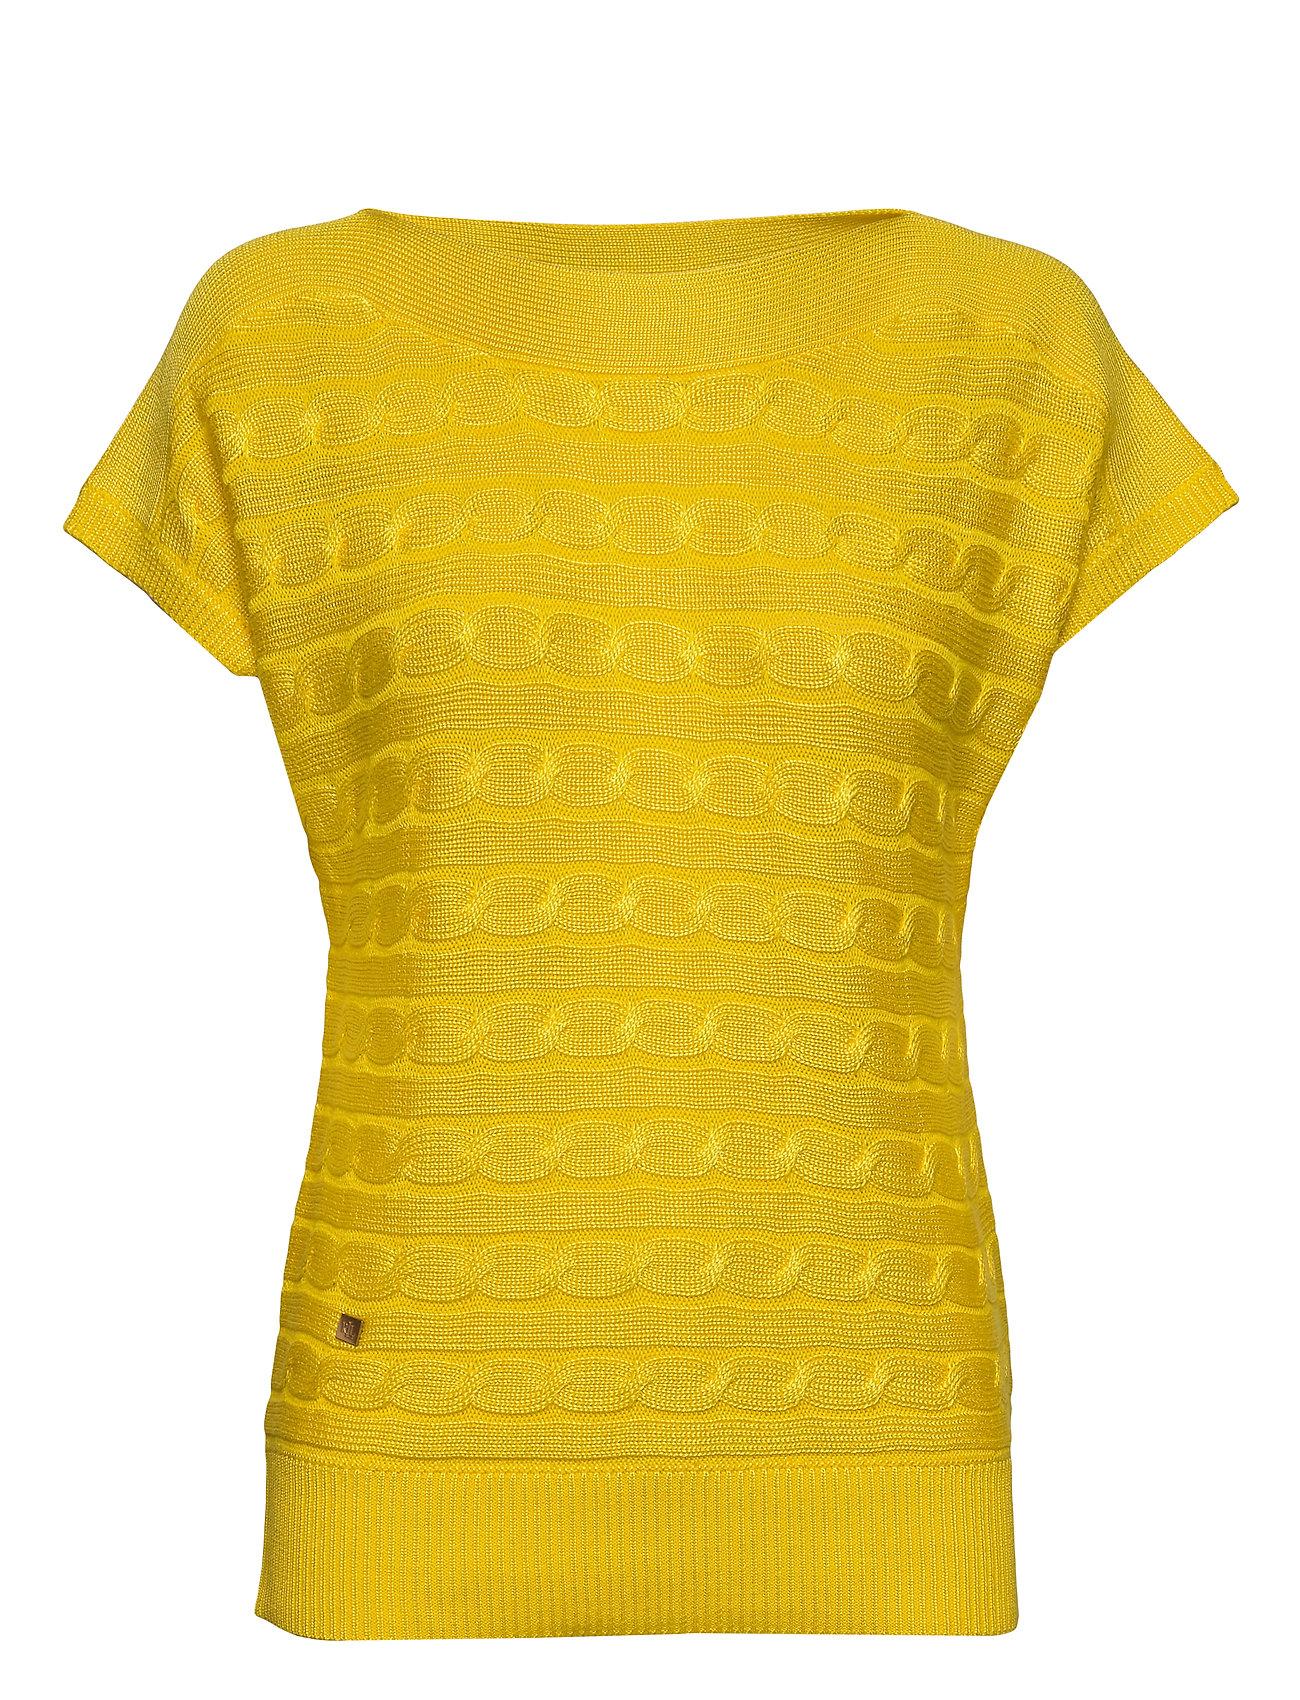 Lauren Ralph Lauren Cable-Knit Boatneck Sweater - DANDELION FIELDS